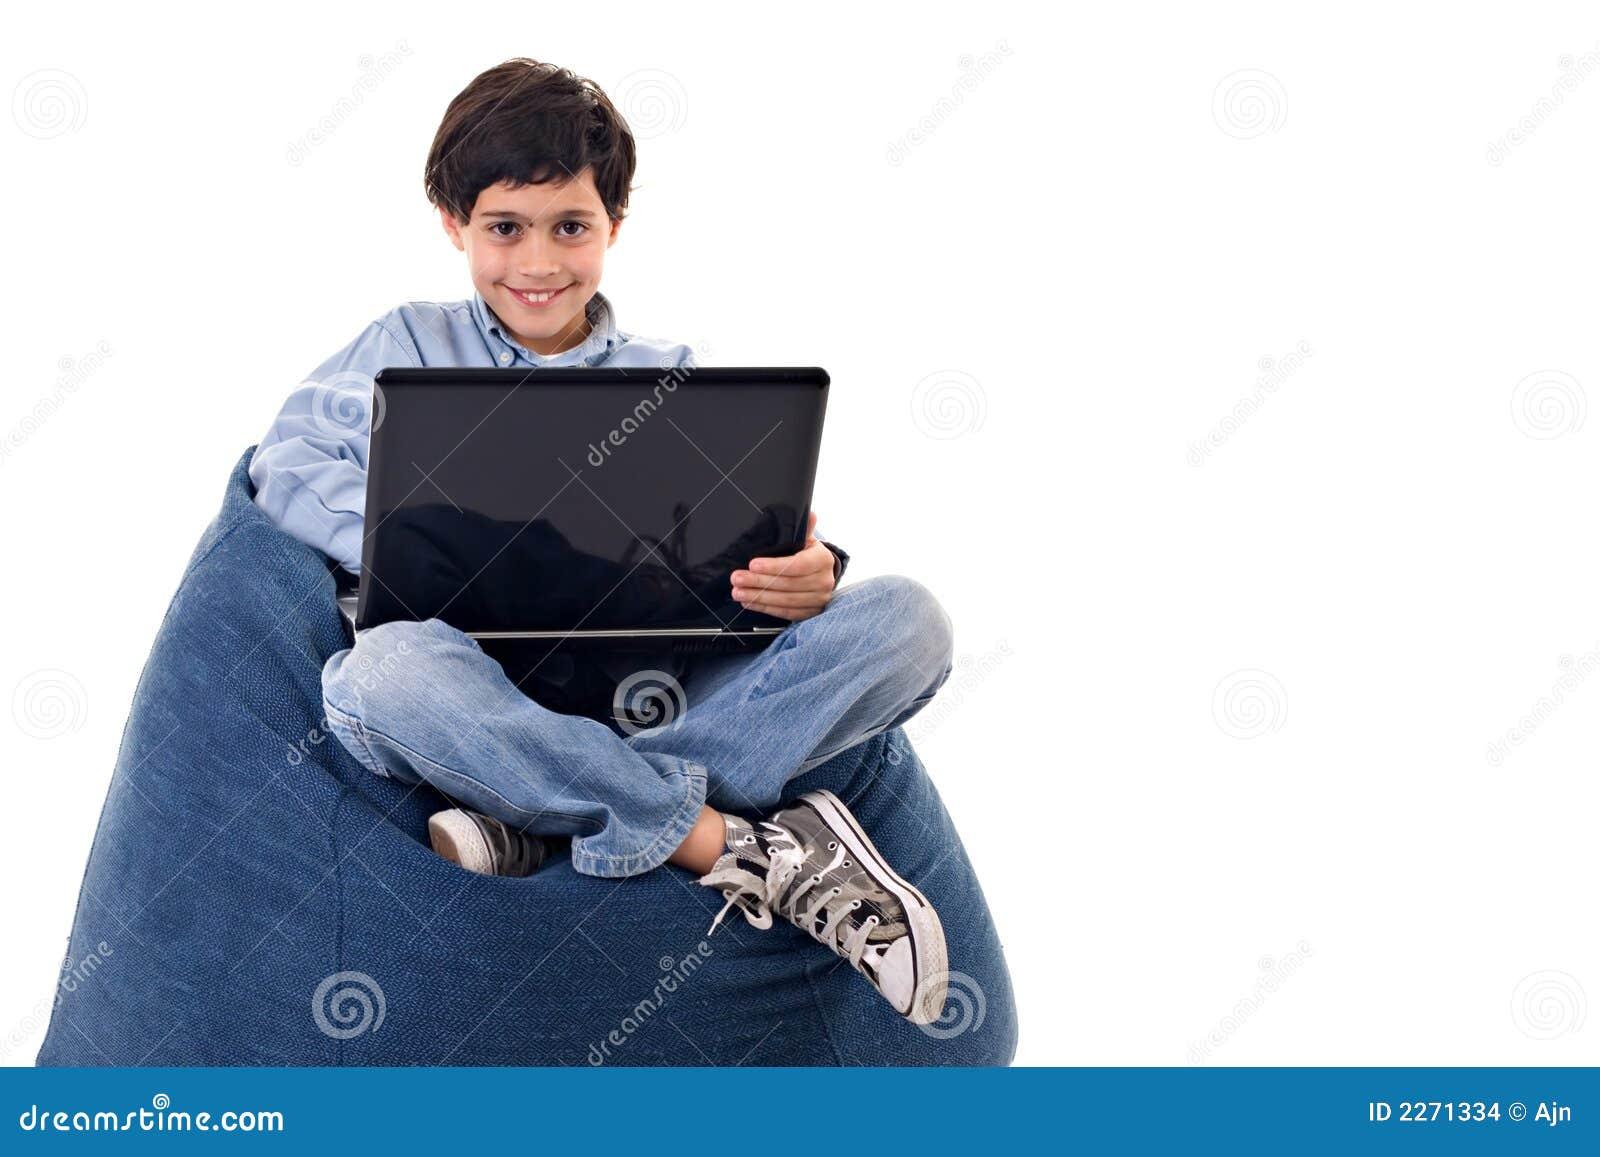 Cute kid using a notebook